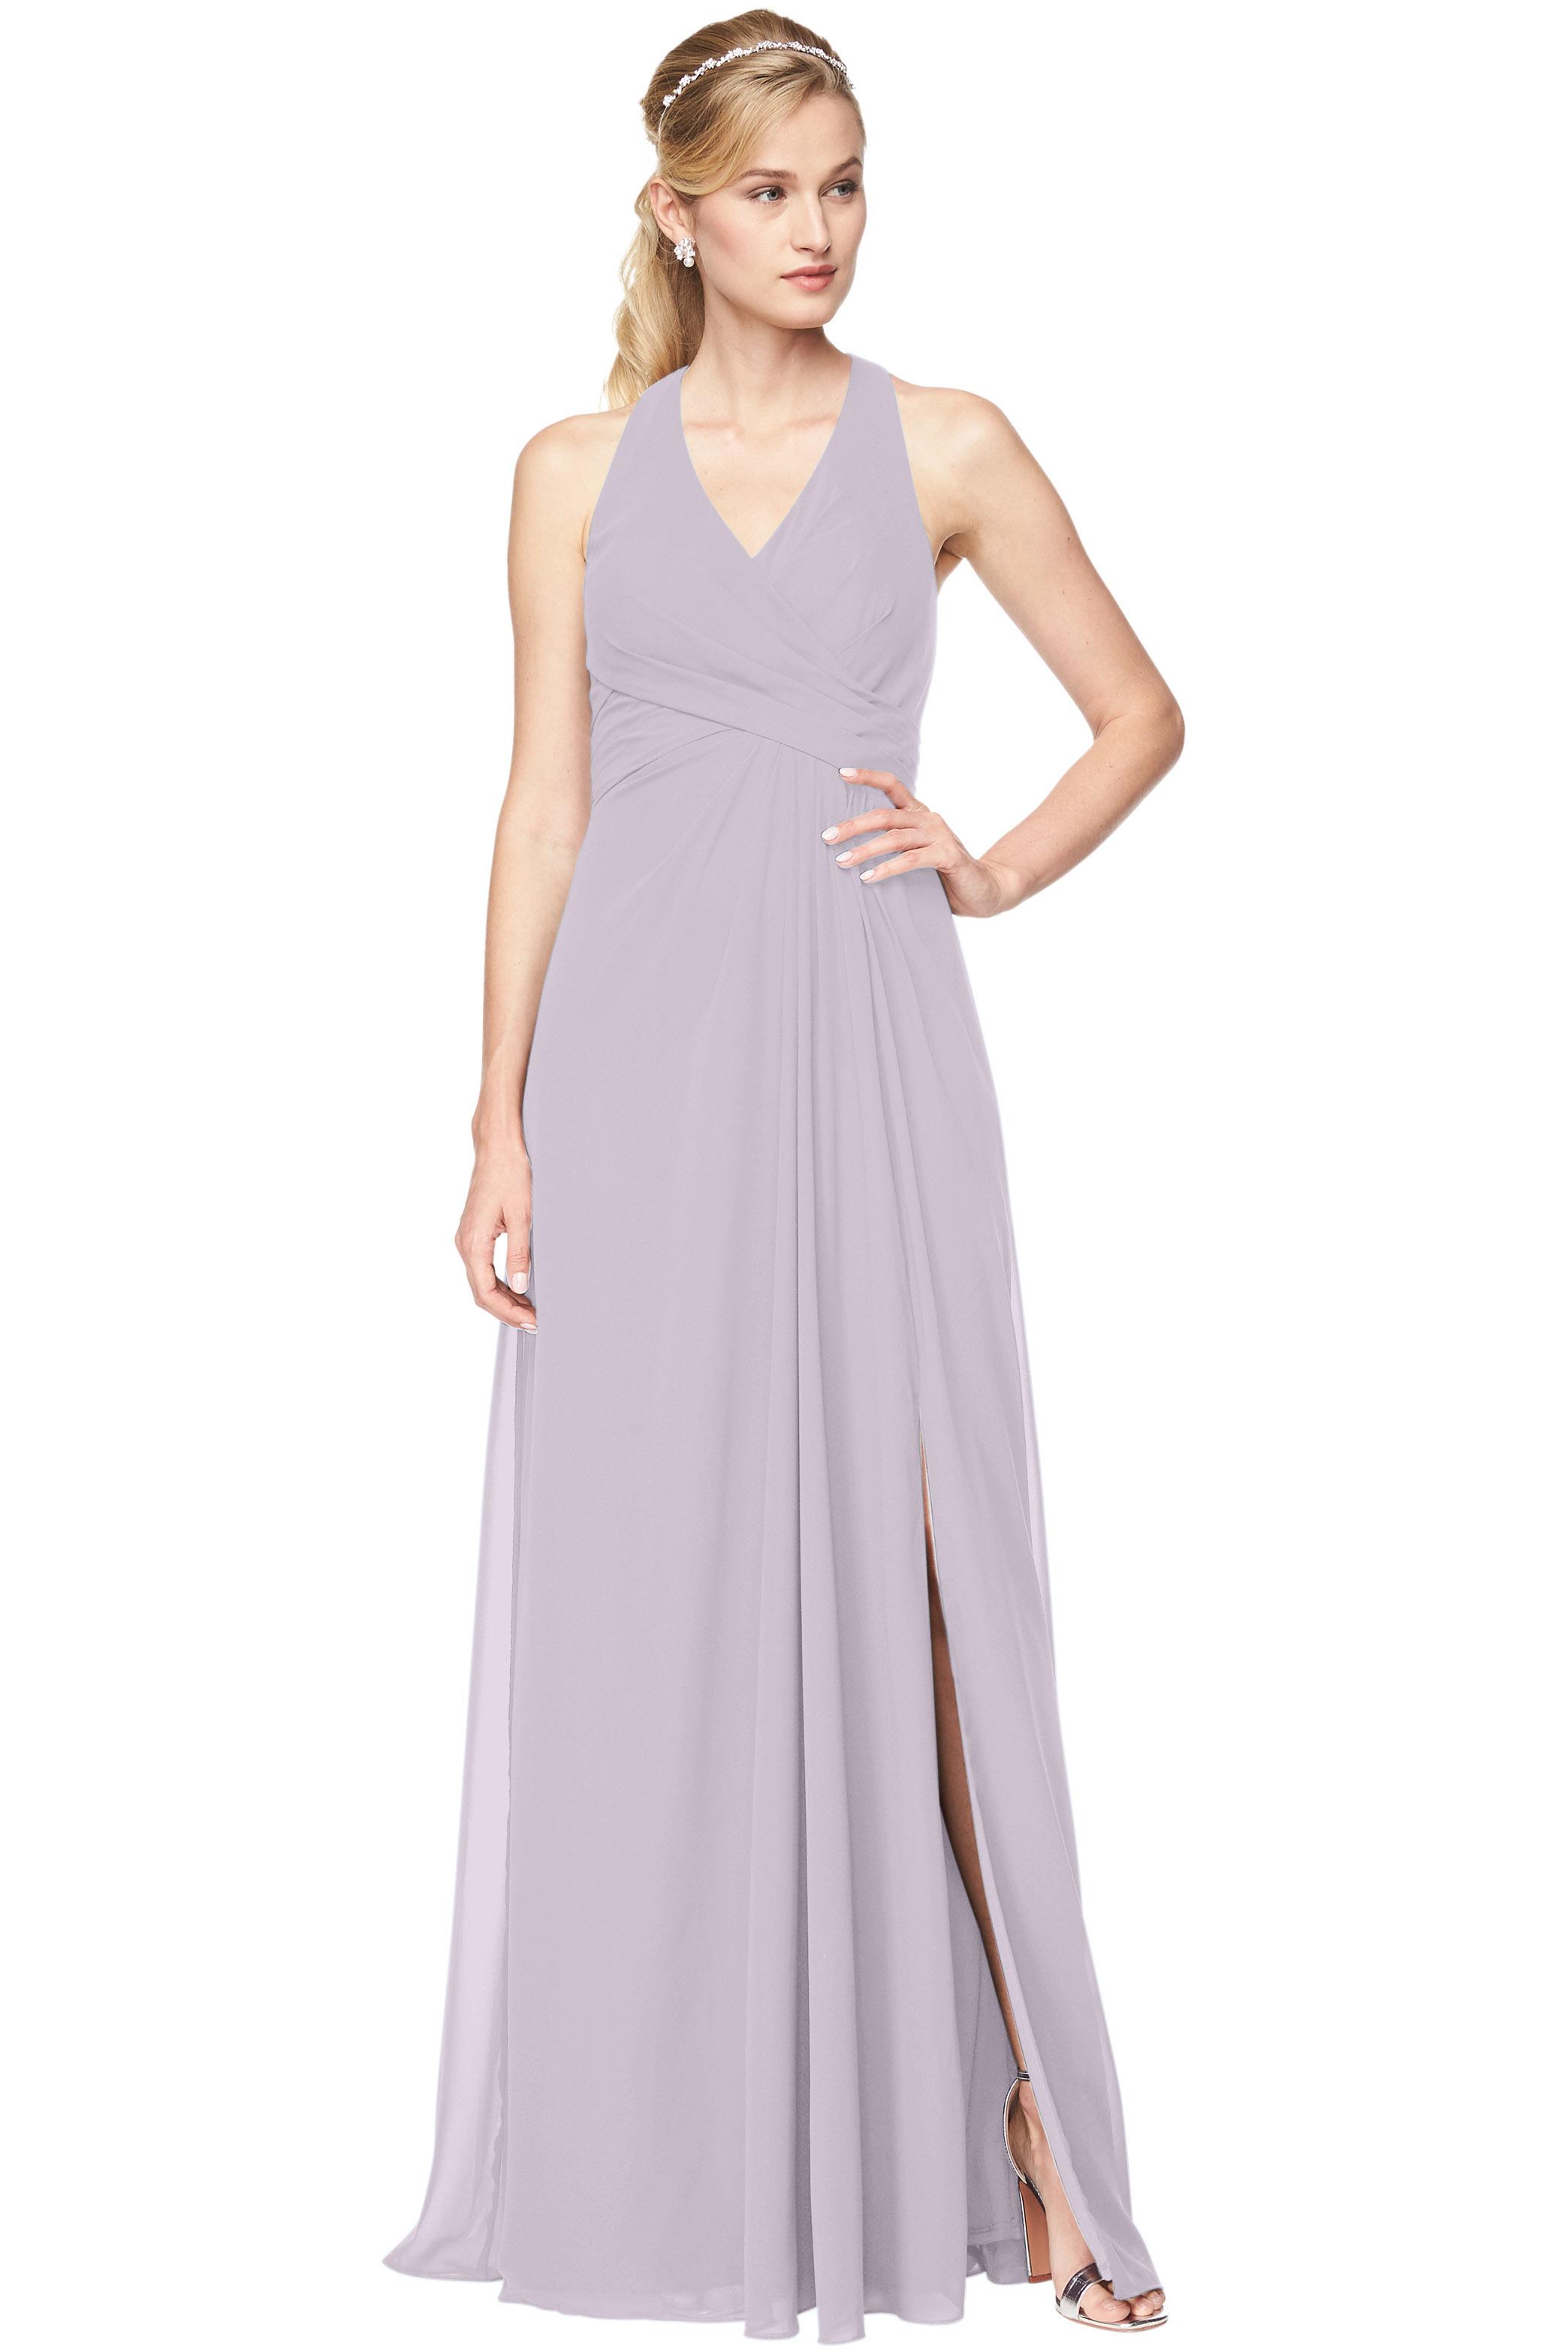 Bill Levkoff VIOLET Chiffon V-Neck, Halter A-Line gown, $168.30 Front